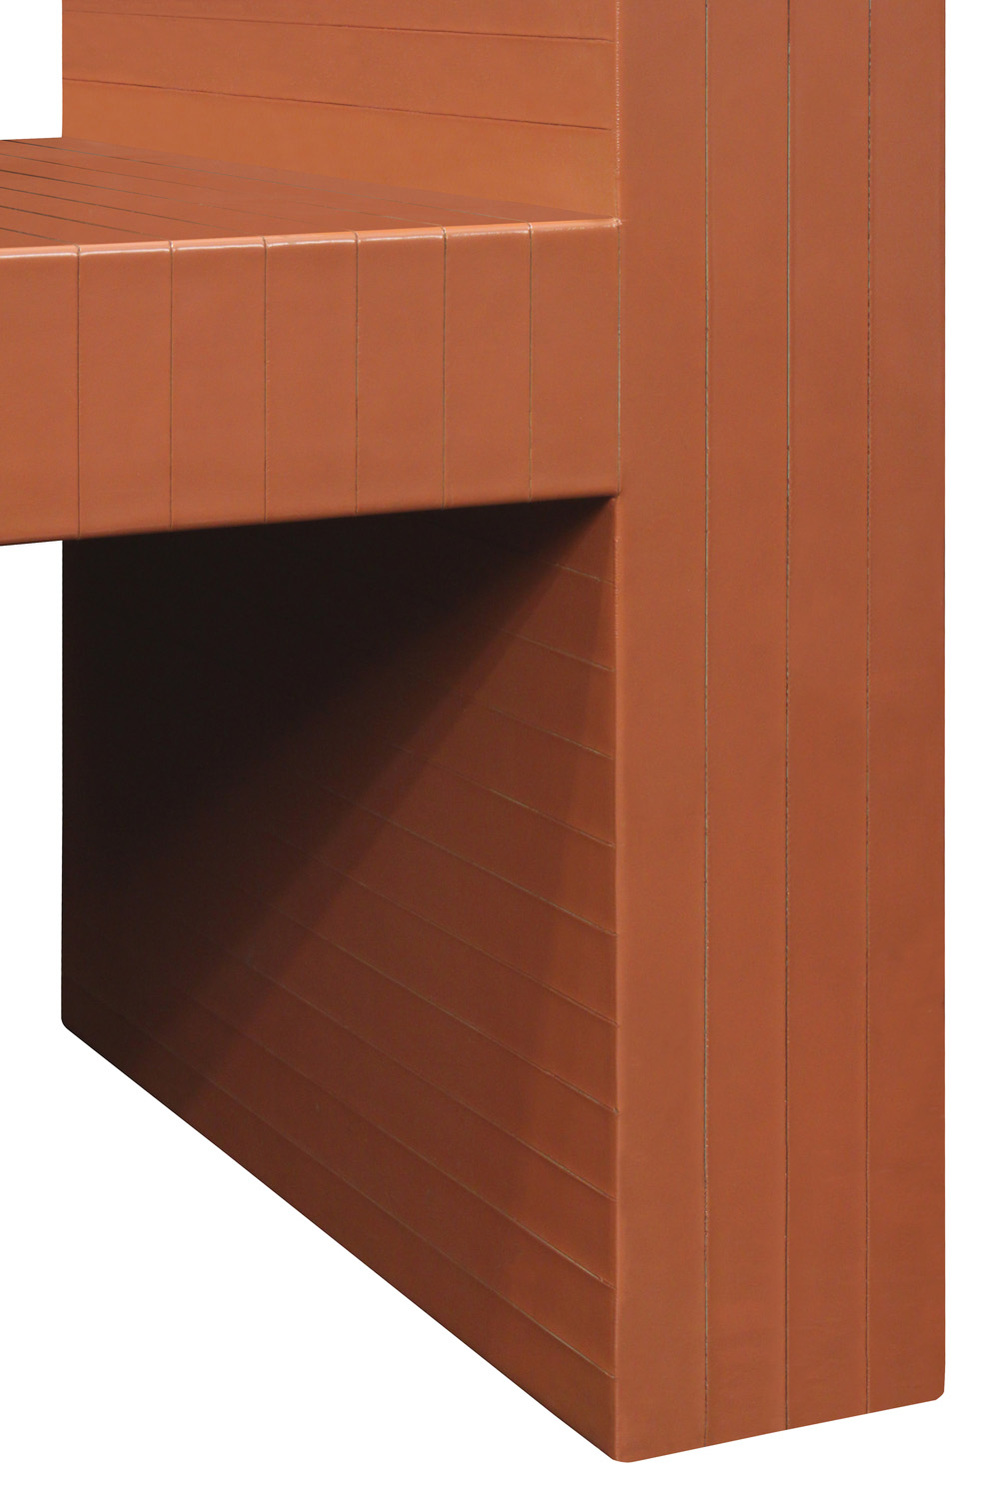 Springer 120 scored leather bench126 detail4 hires.jpg